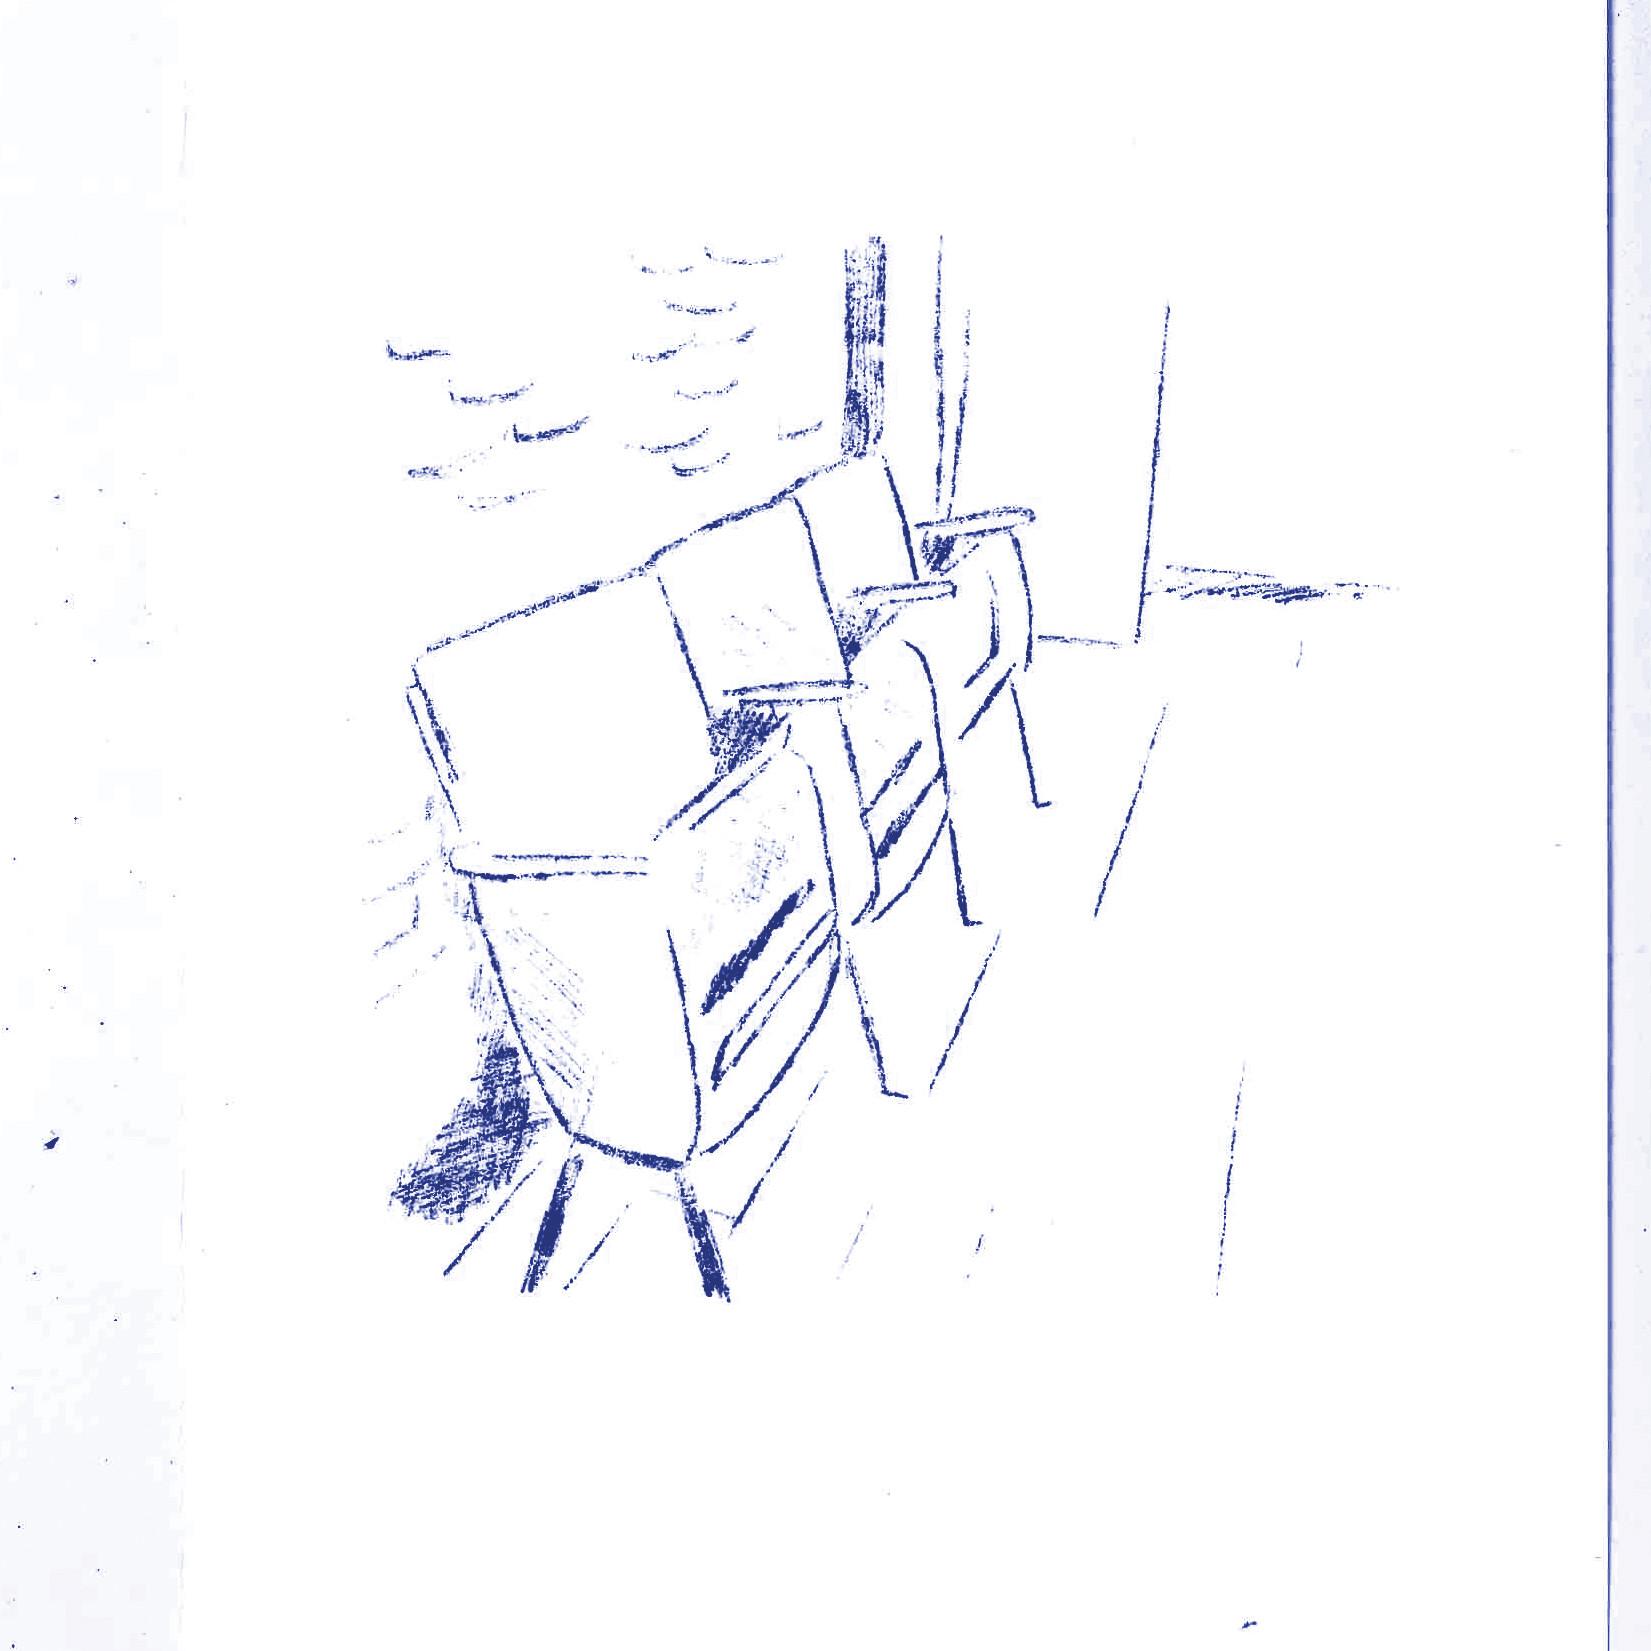 passaggi steri sale 4